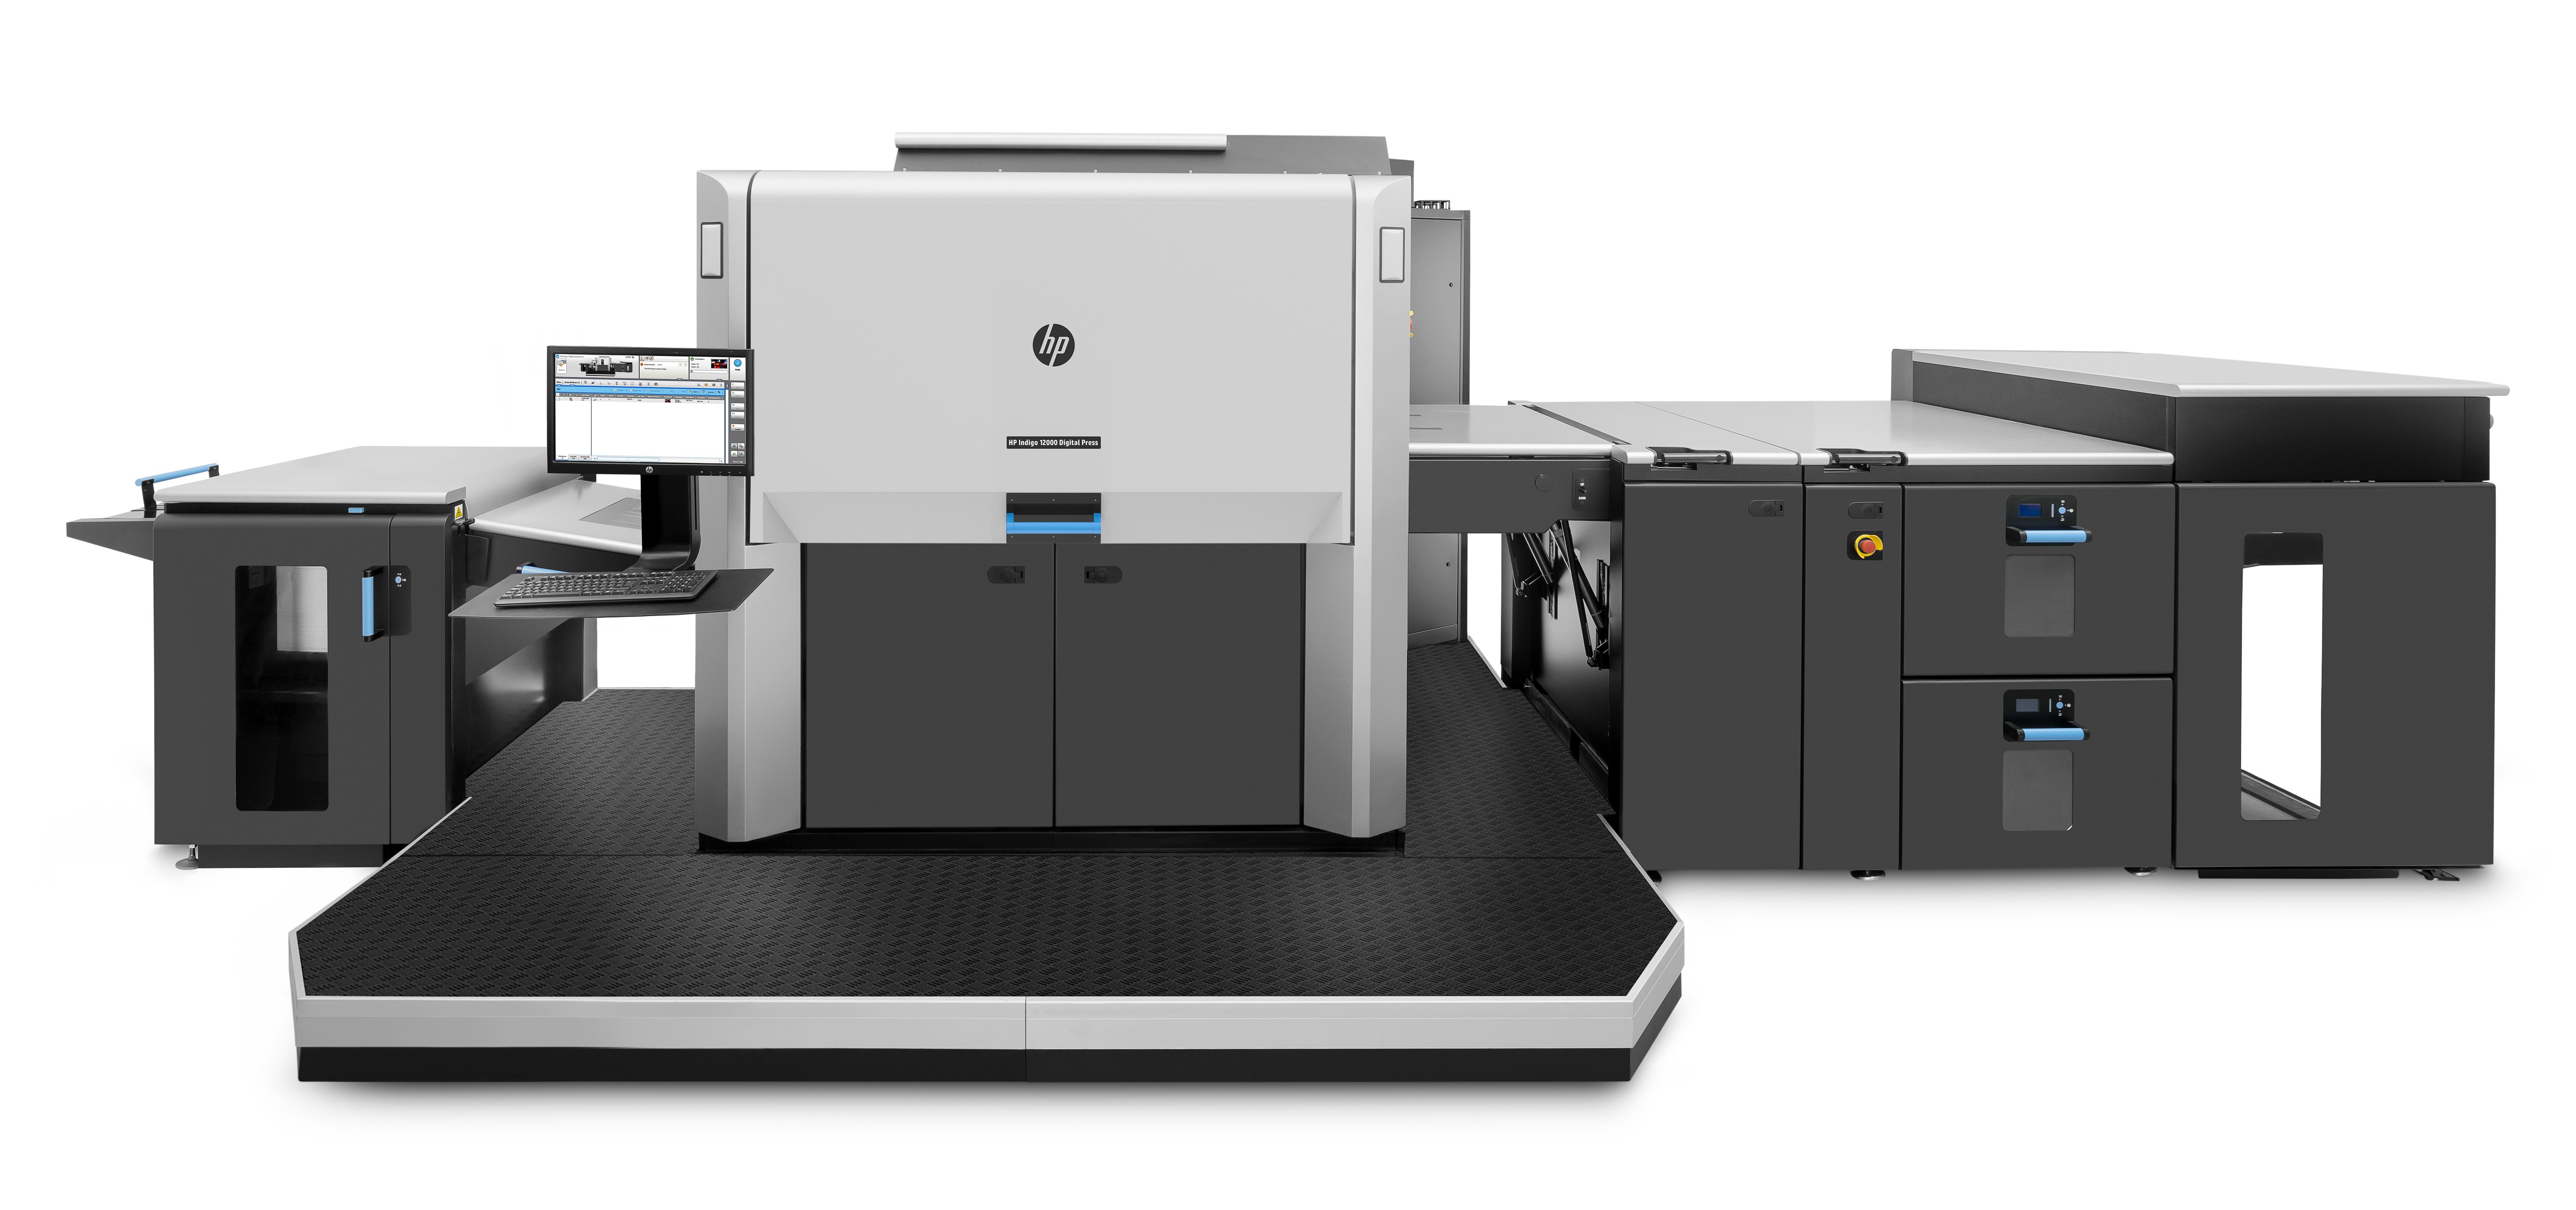 HP Indigo 12000 Digital Press Image